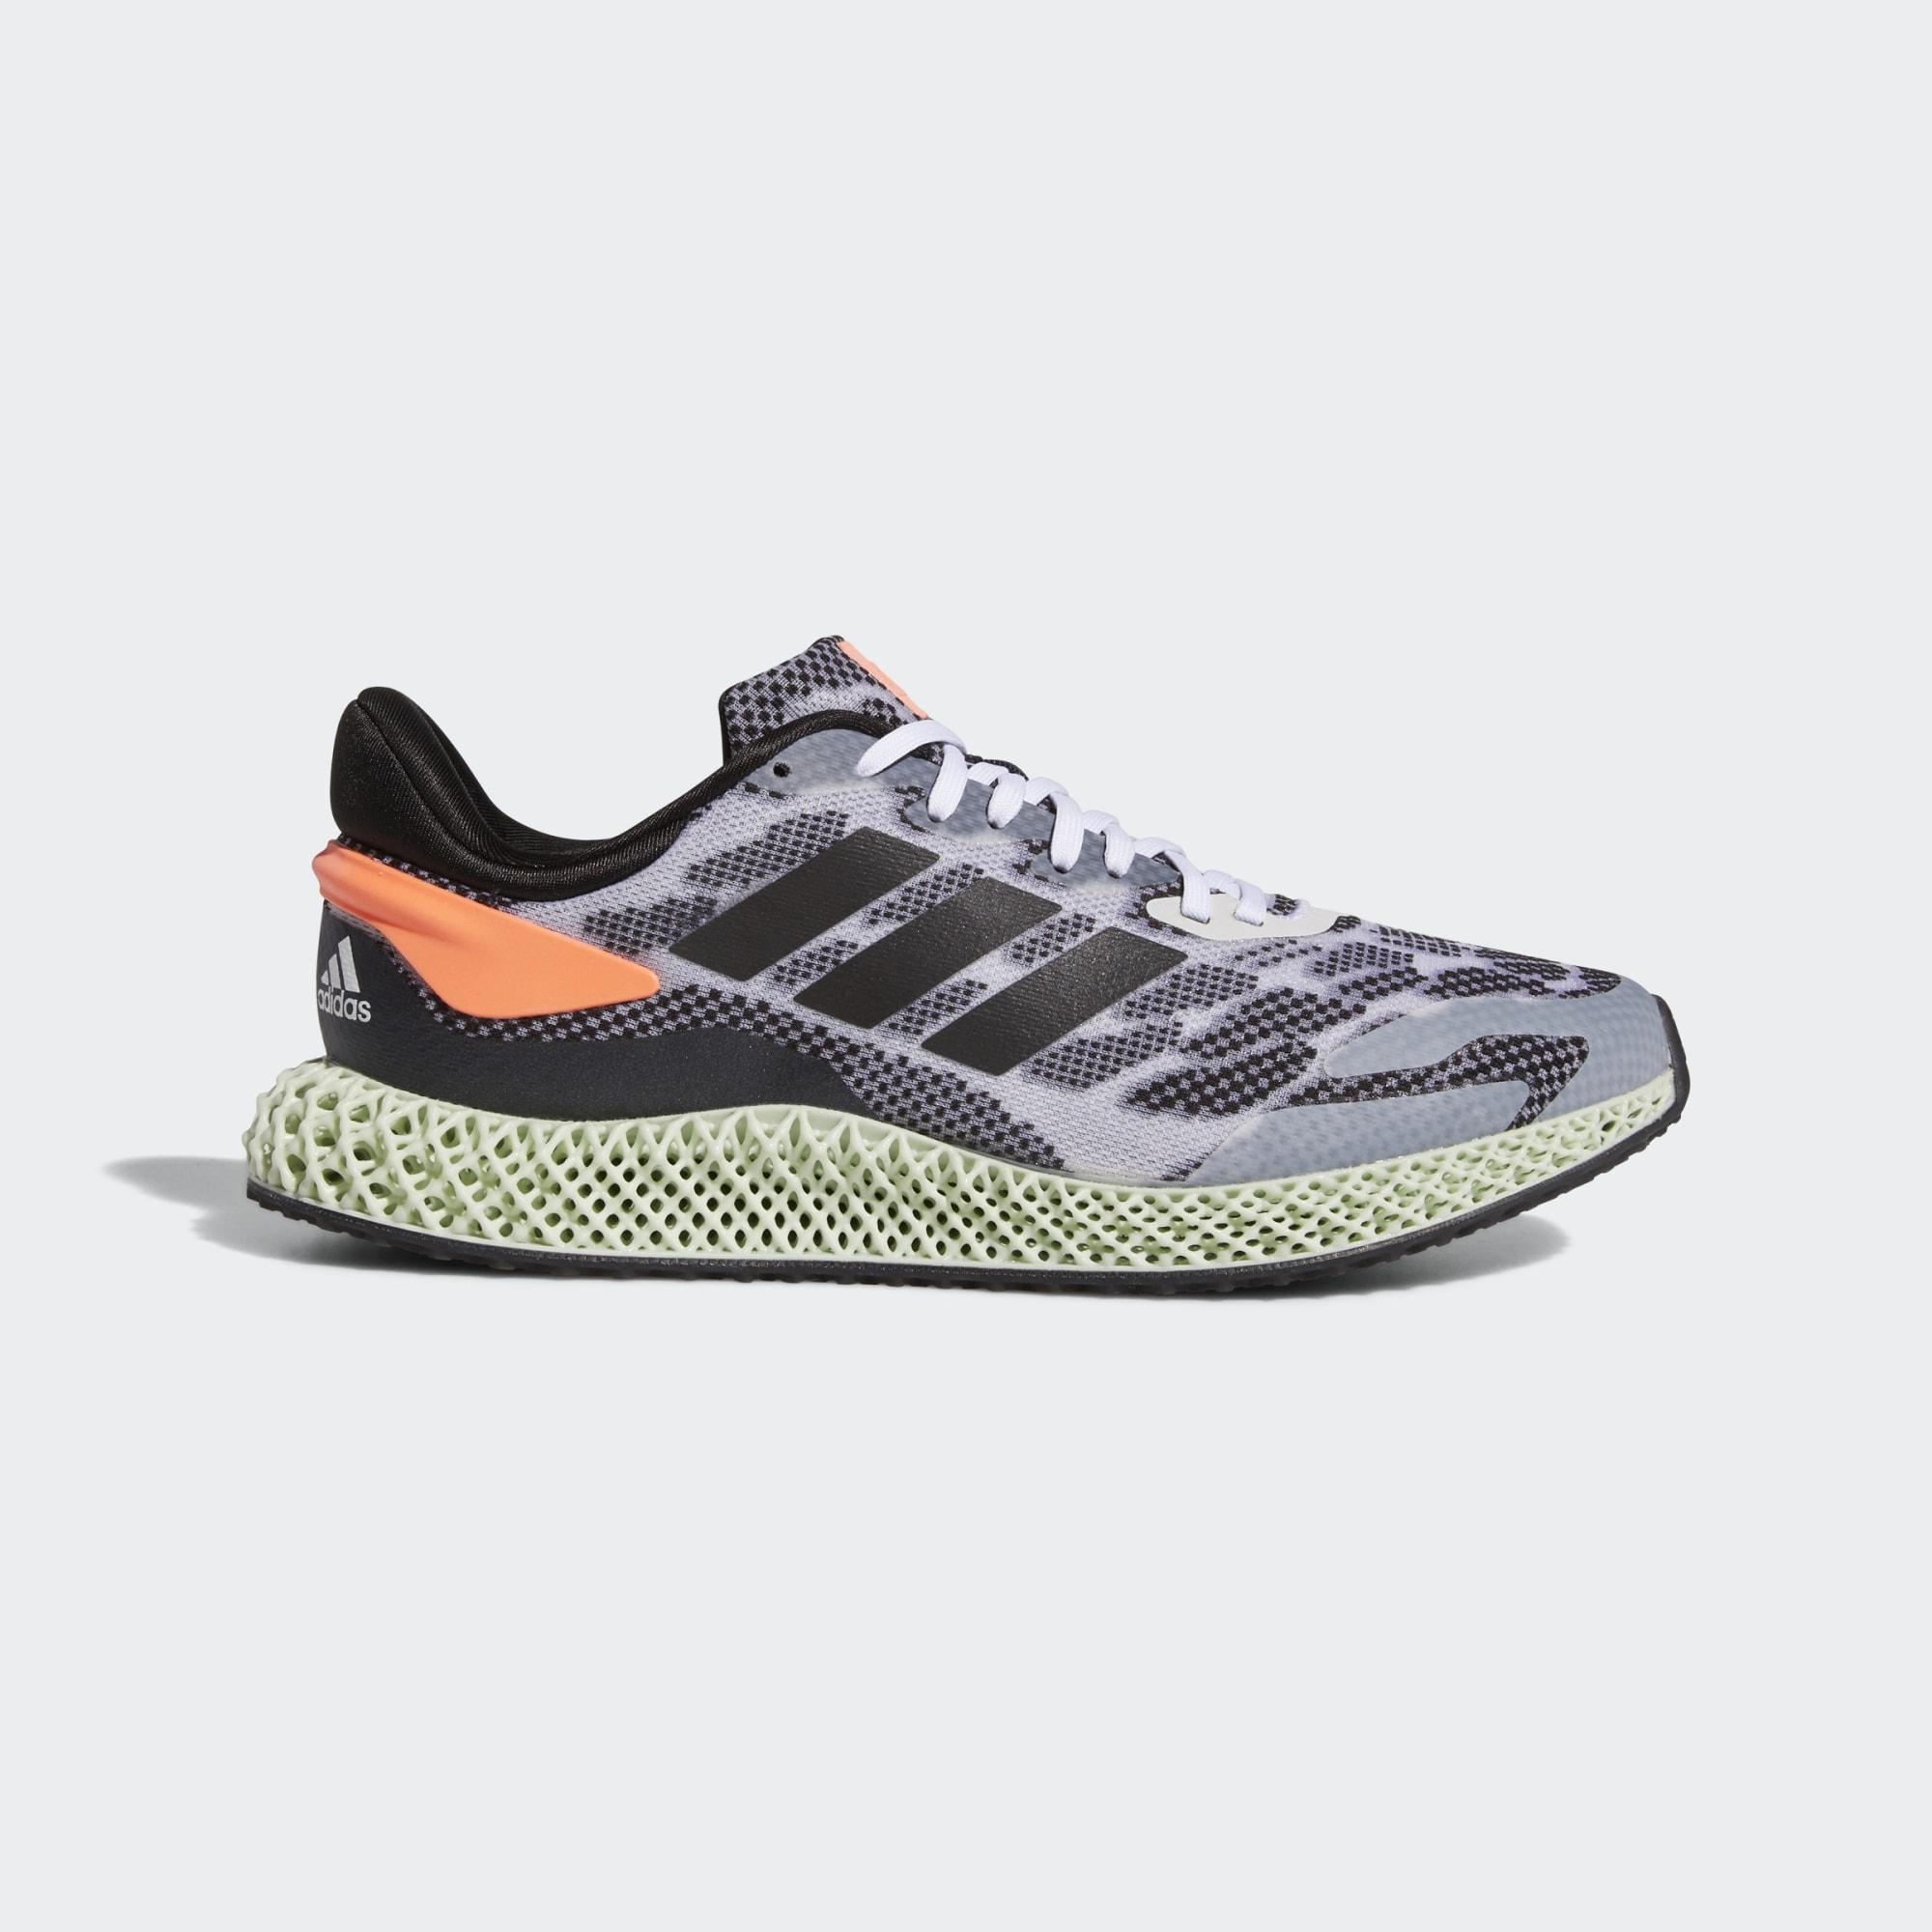 giay-sneaker-nam-adidas-4d-run-1-0-fw1233-core-black-signal-coral-hang-chinh-han